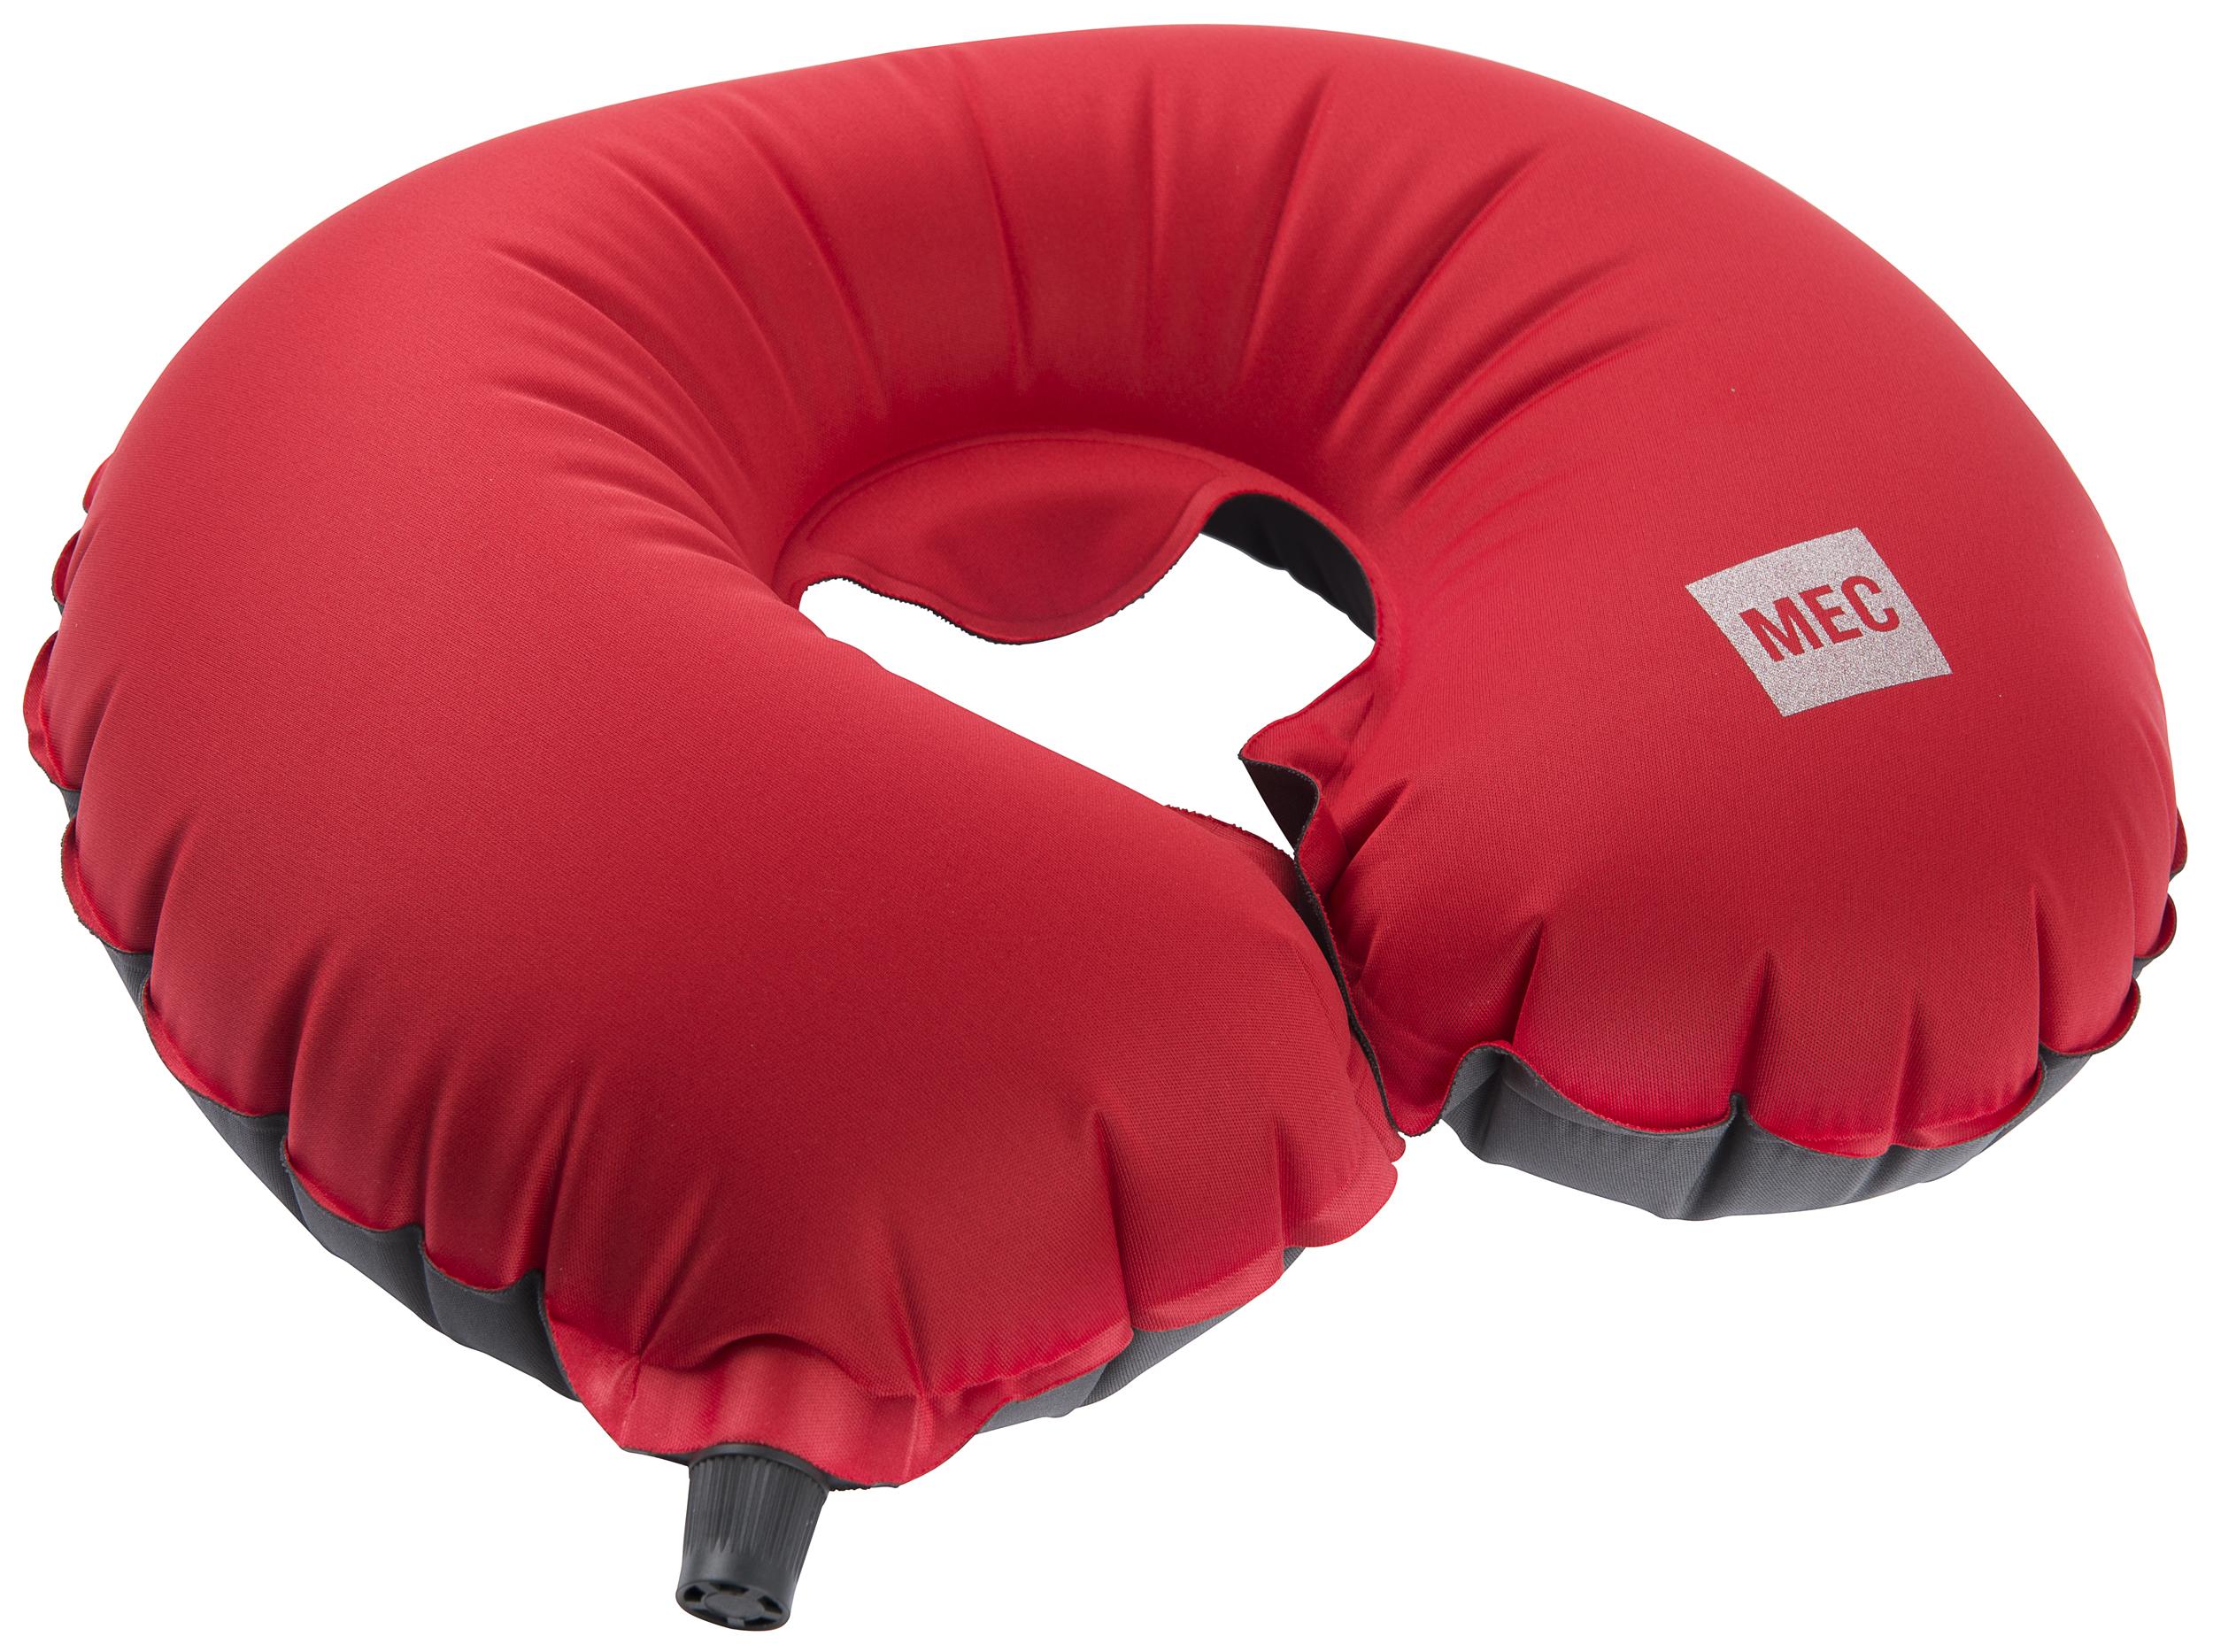 ekm cushion pillow pack decorative p covers trellis design red asp